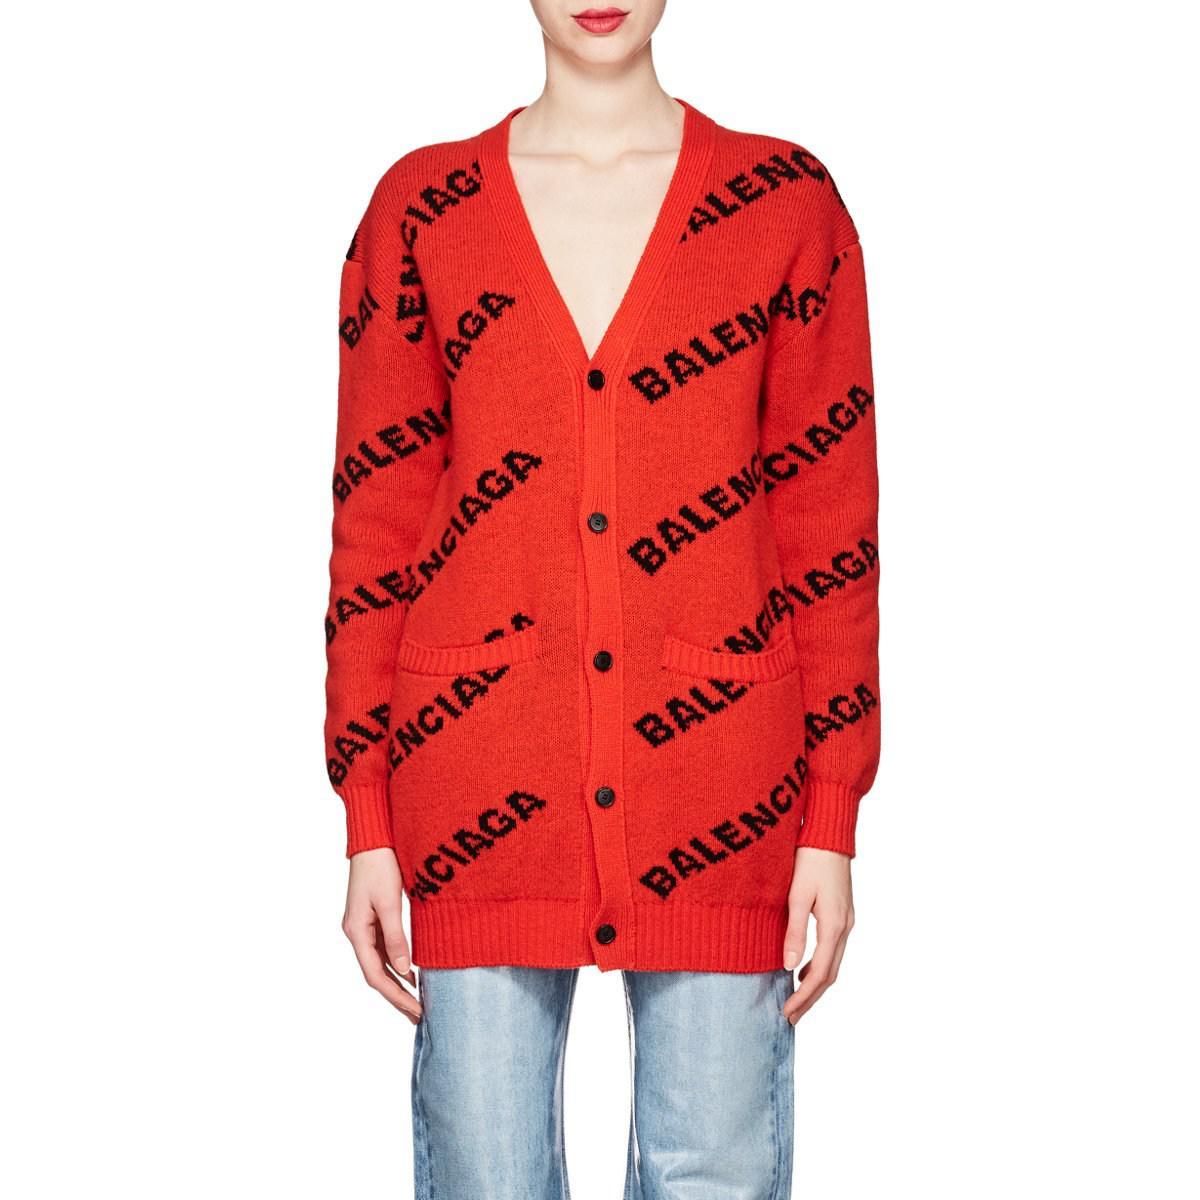 Balenciaga - Red Logo Jacquard Virgin Wool Blend Cardigan - Lyst. View  fullscreen 48ce9ea16